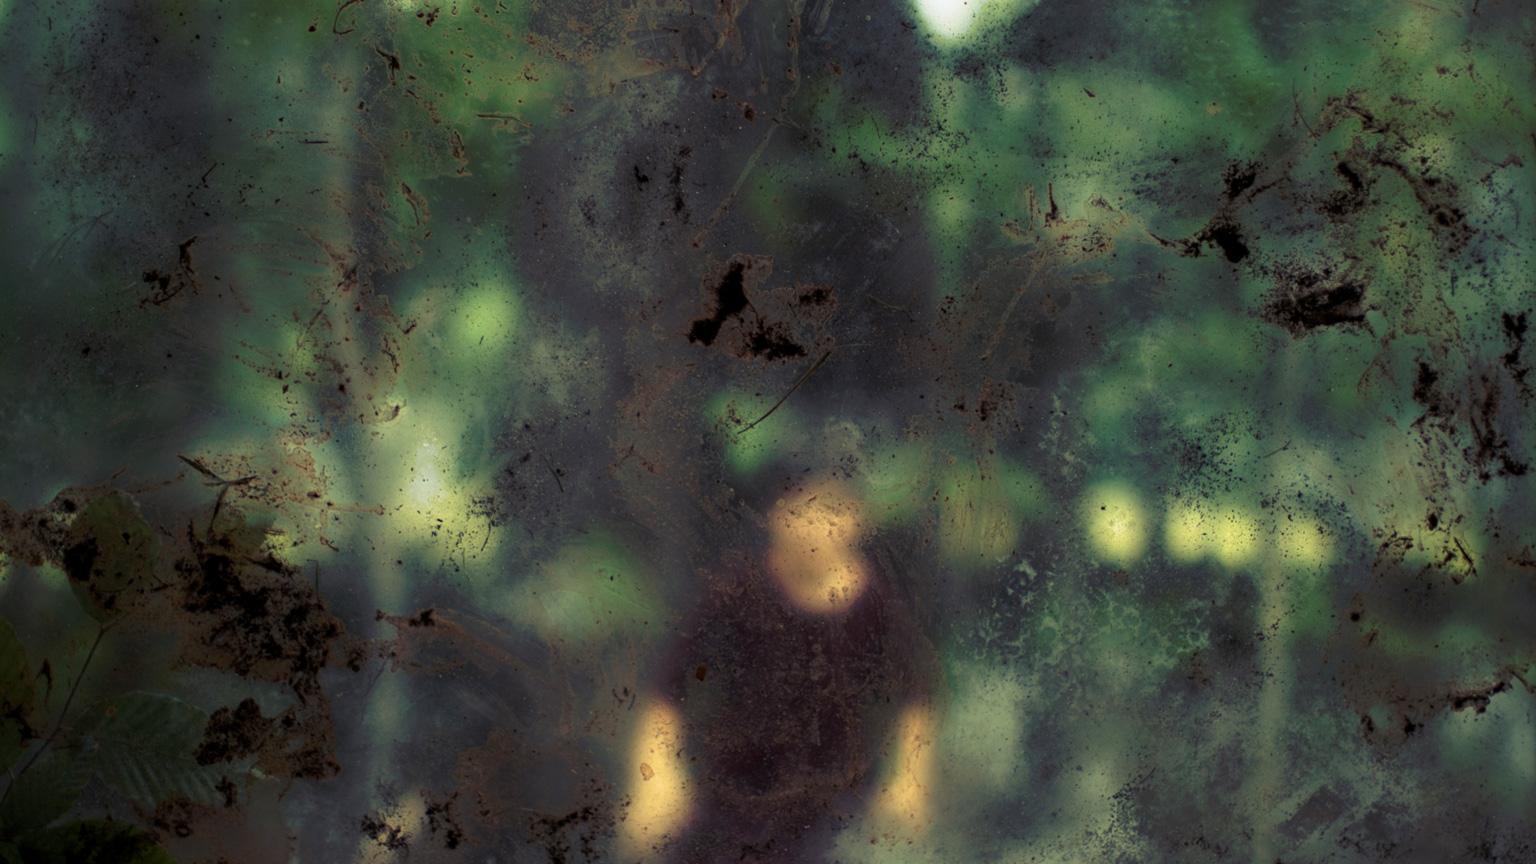 Conspiracy of Silence, Window 4 #313, 2009, C-Print